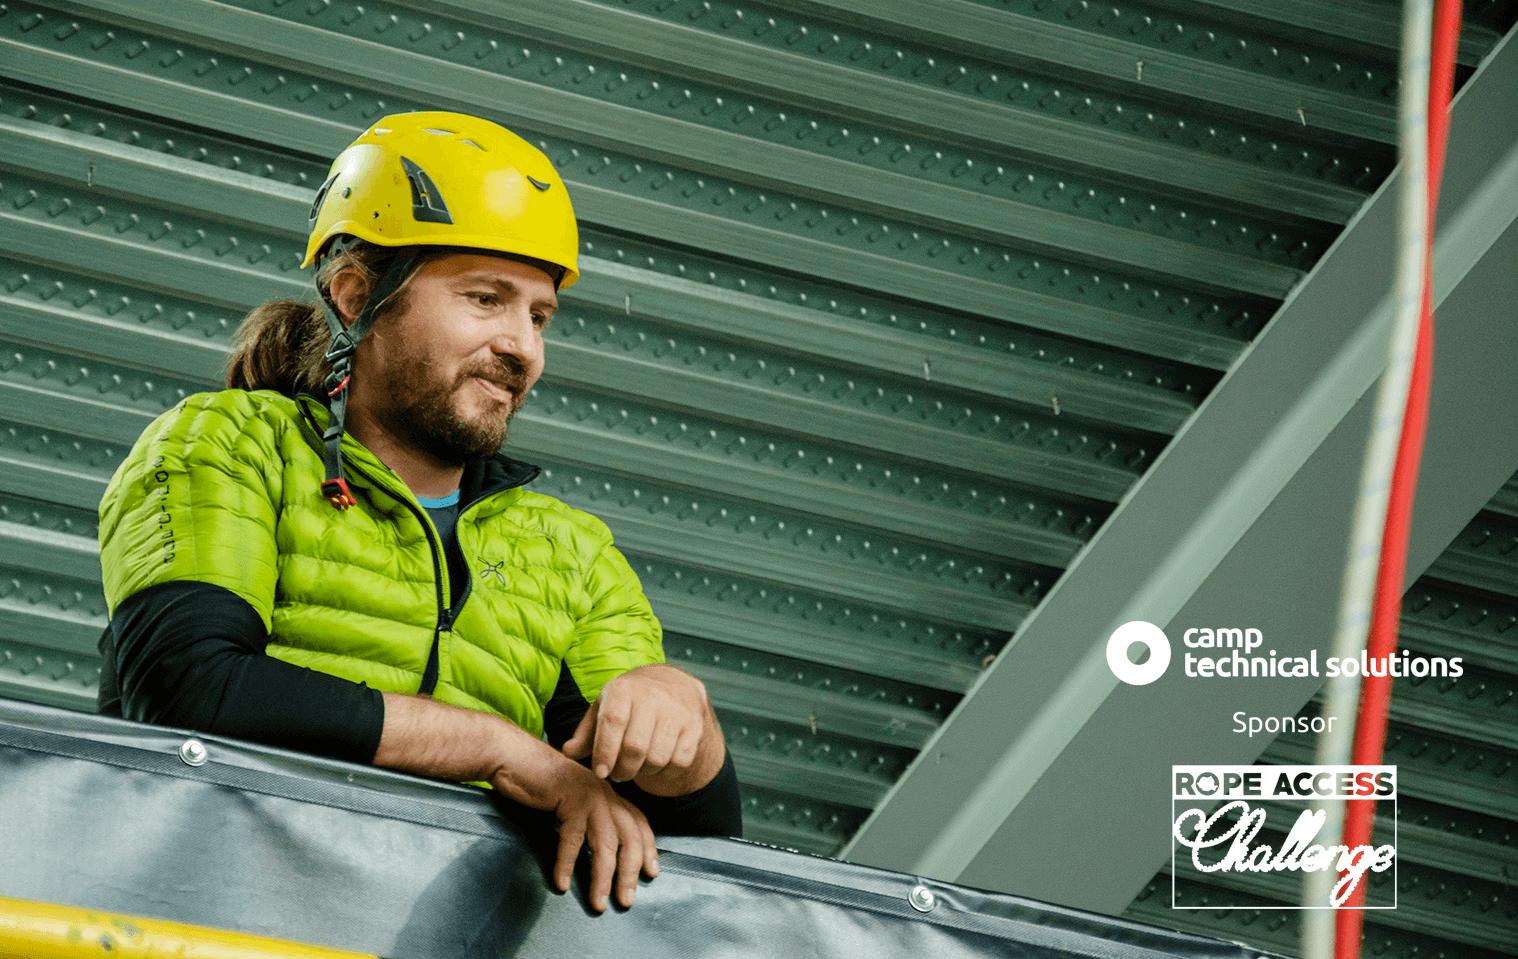 cum-decurs-rope-access-challenge-2019-3